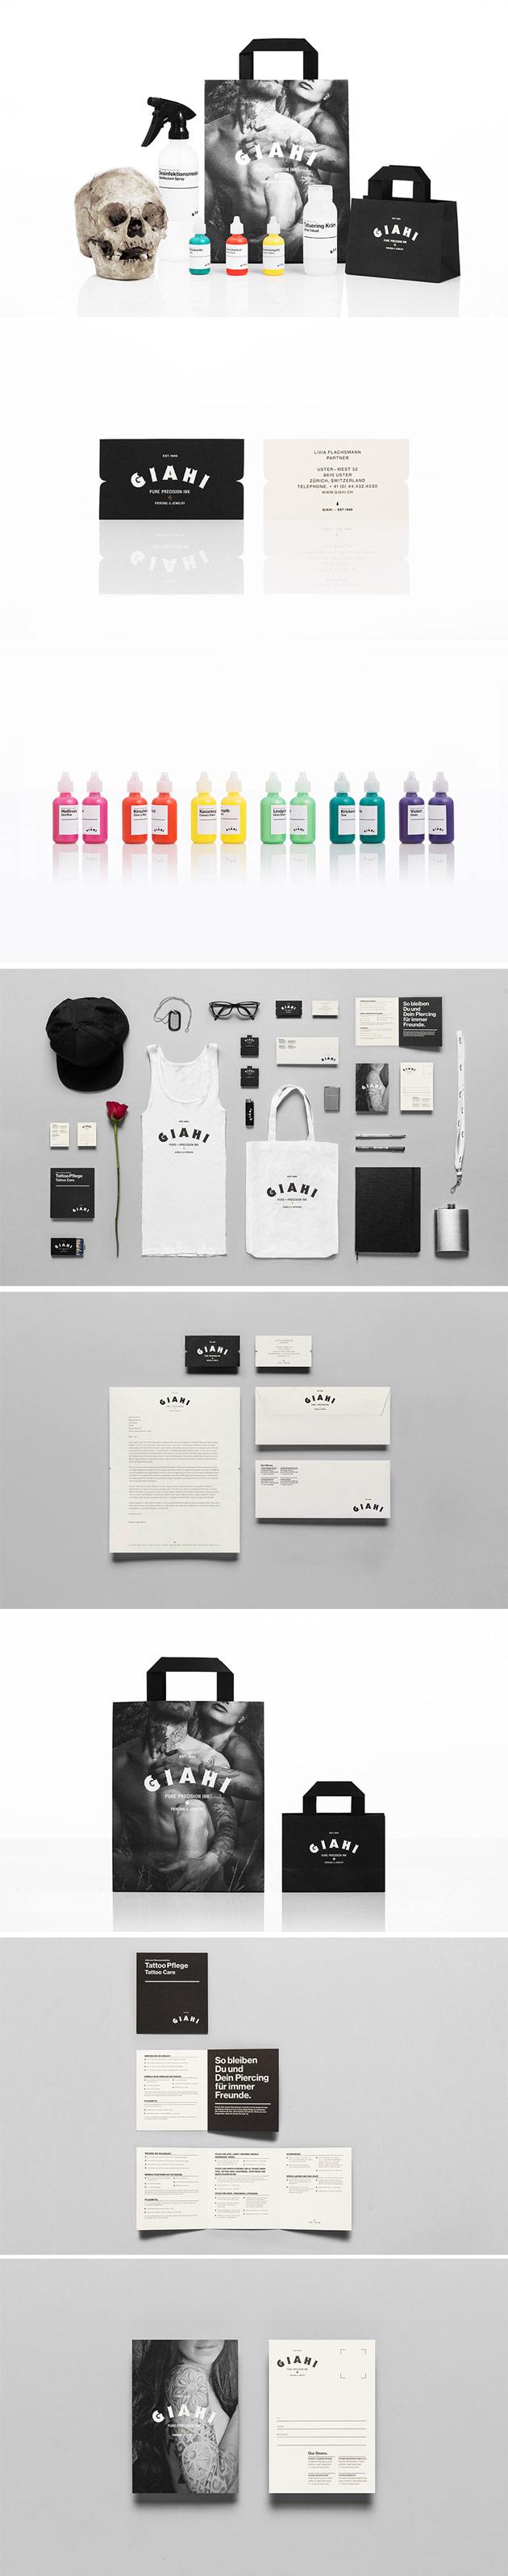 Giahi Corporate branding by Anagrama